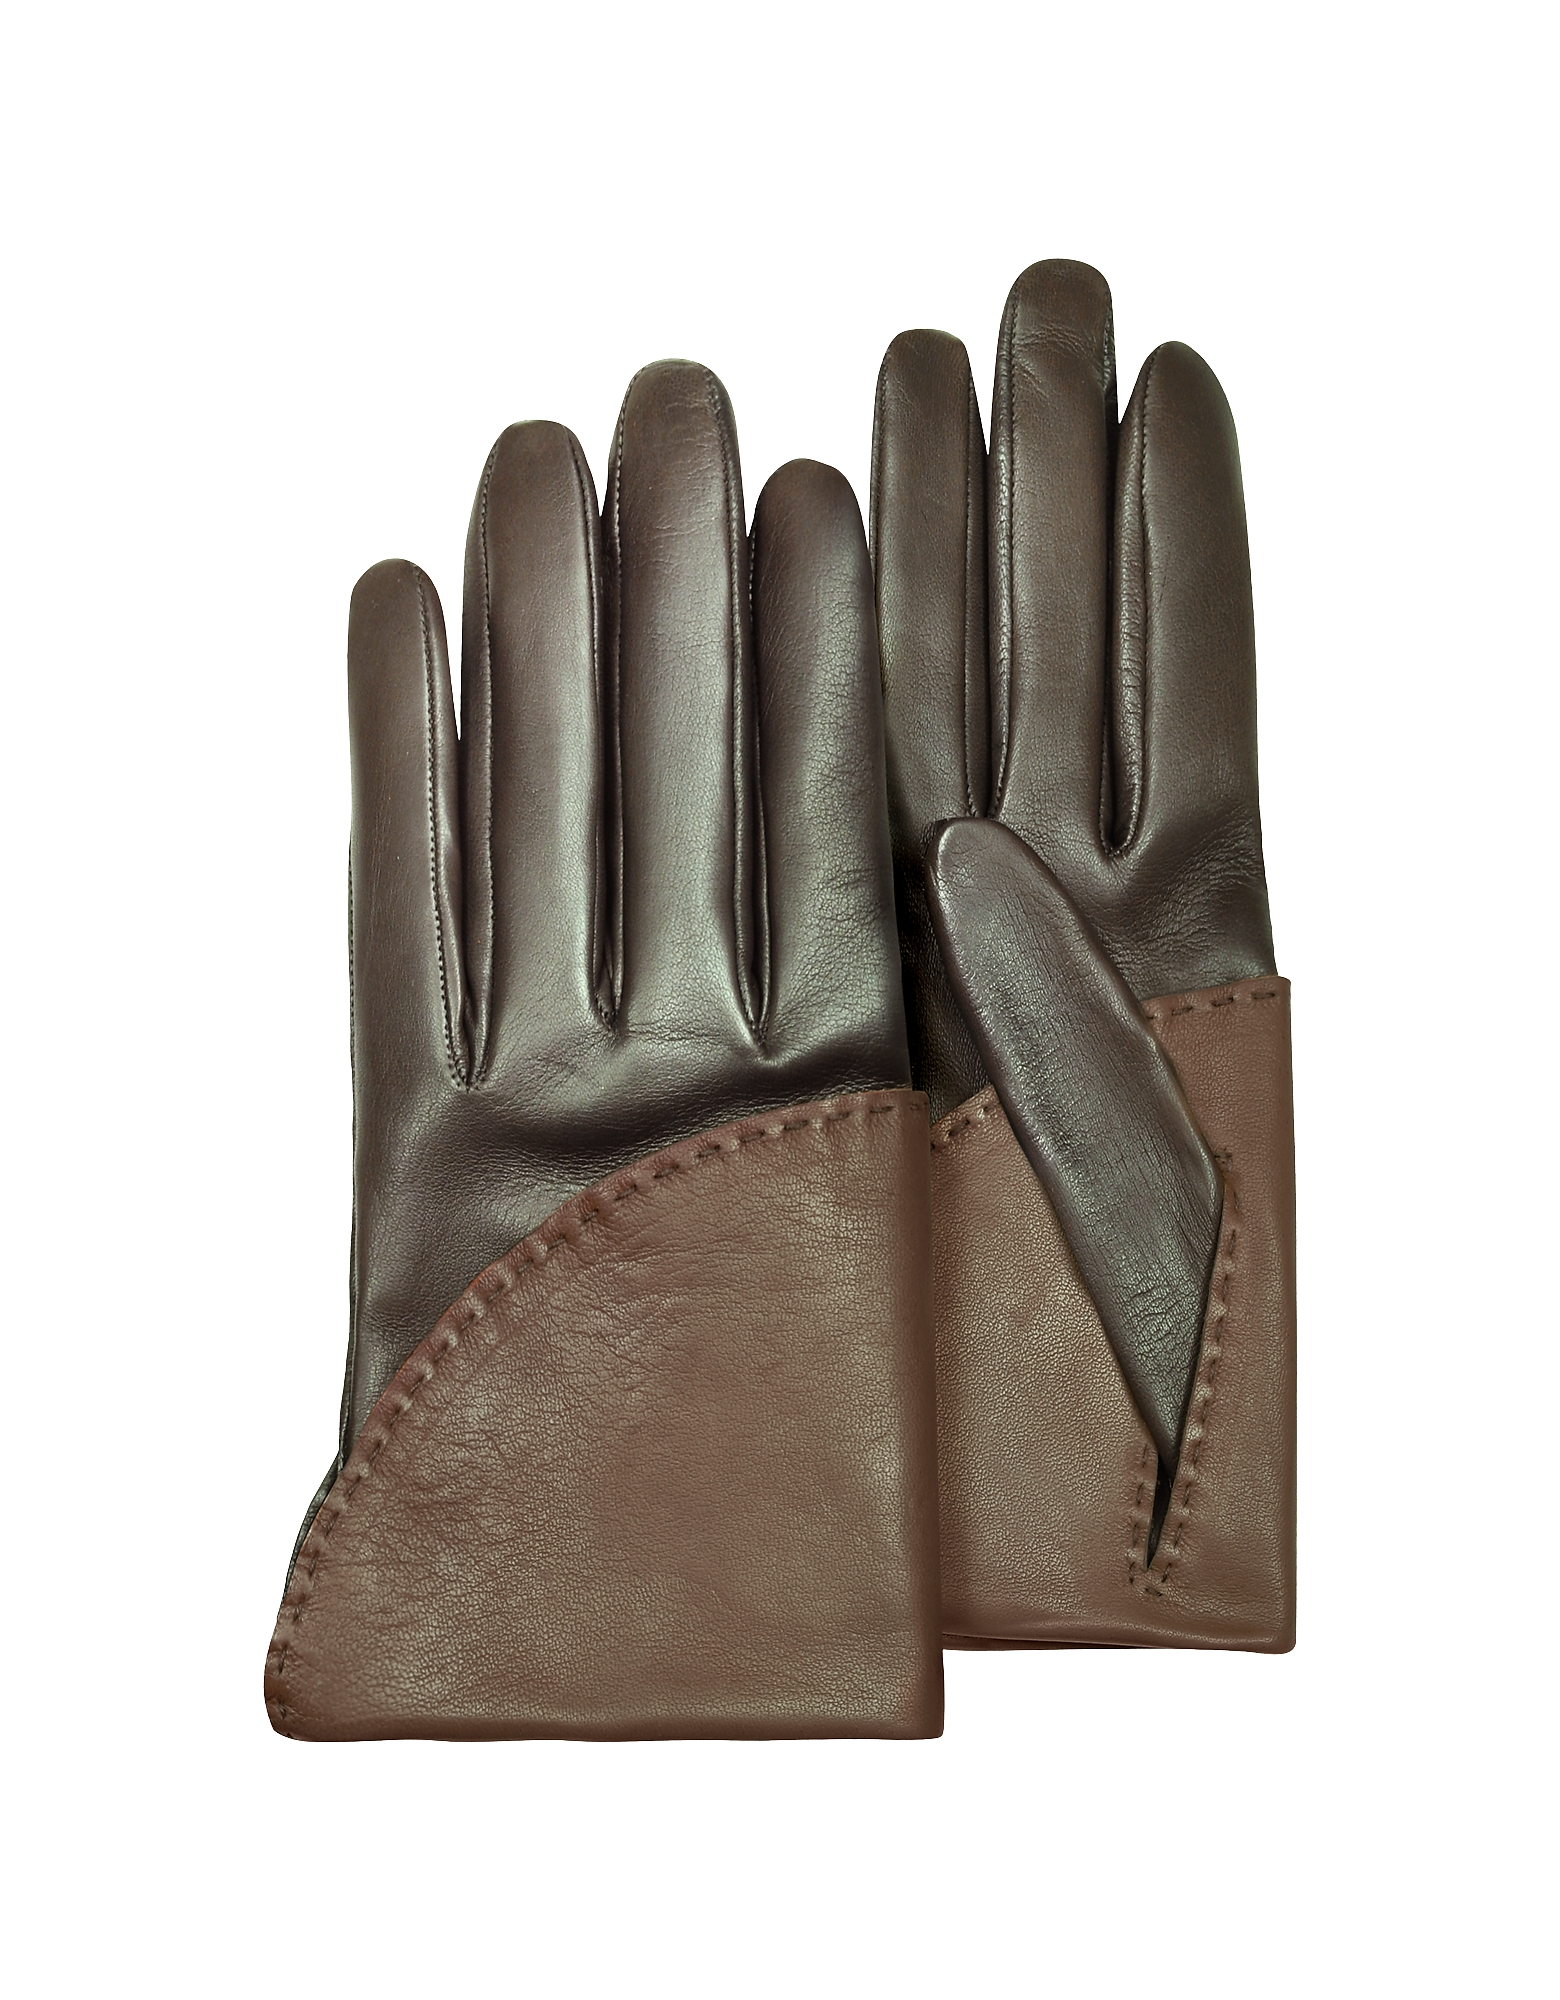 Pineider Women's Gloves, Women's Two-Tone Brown Short Nappa Gloves w/ Silk Lining